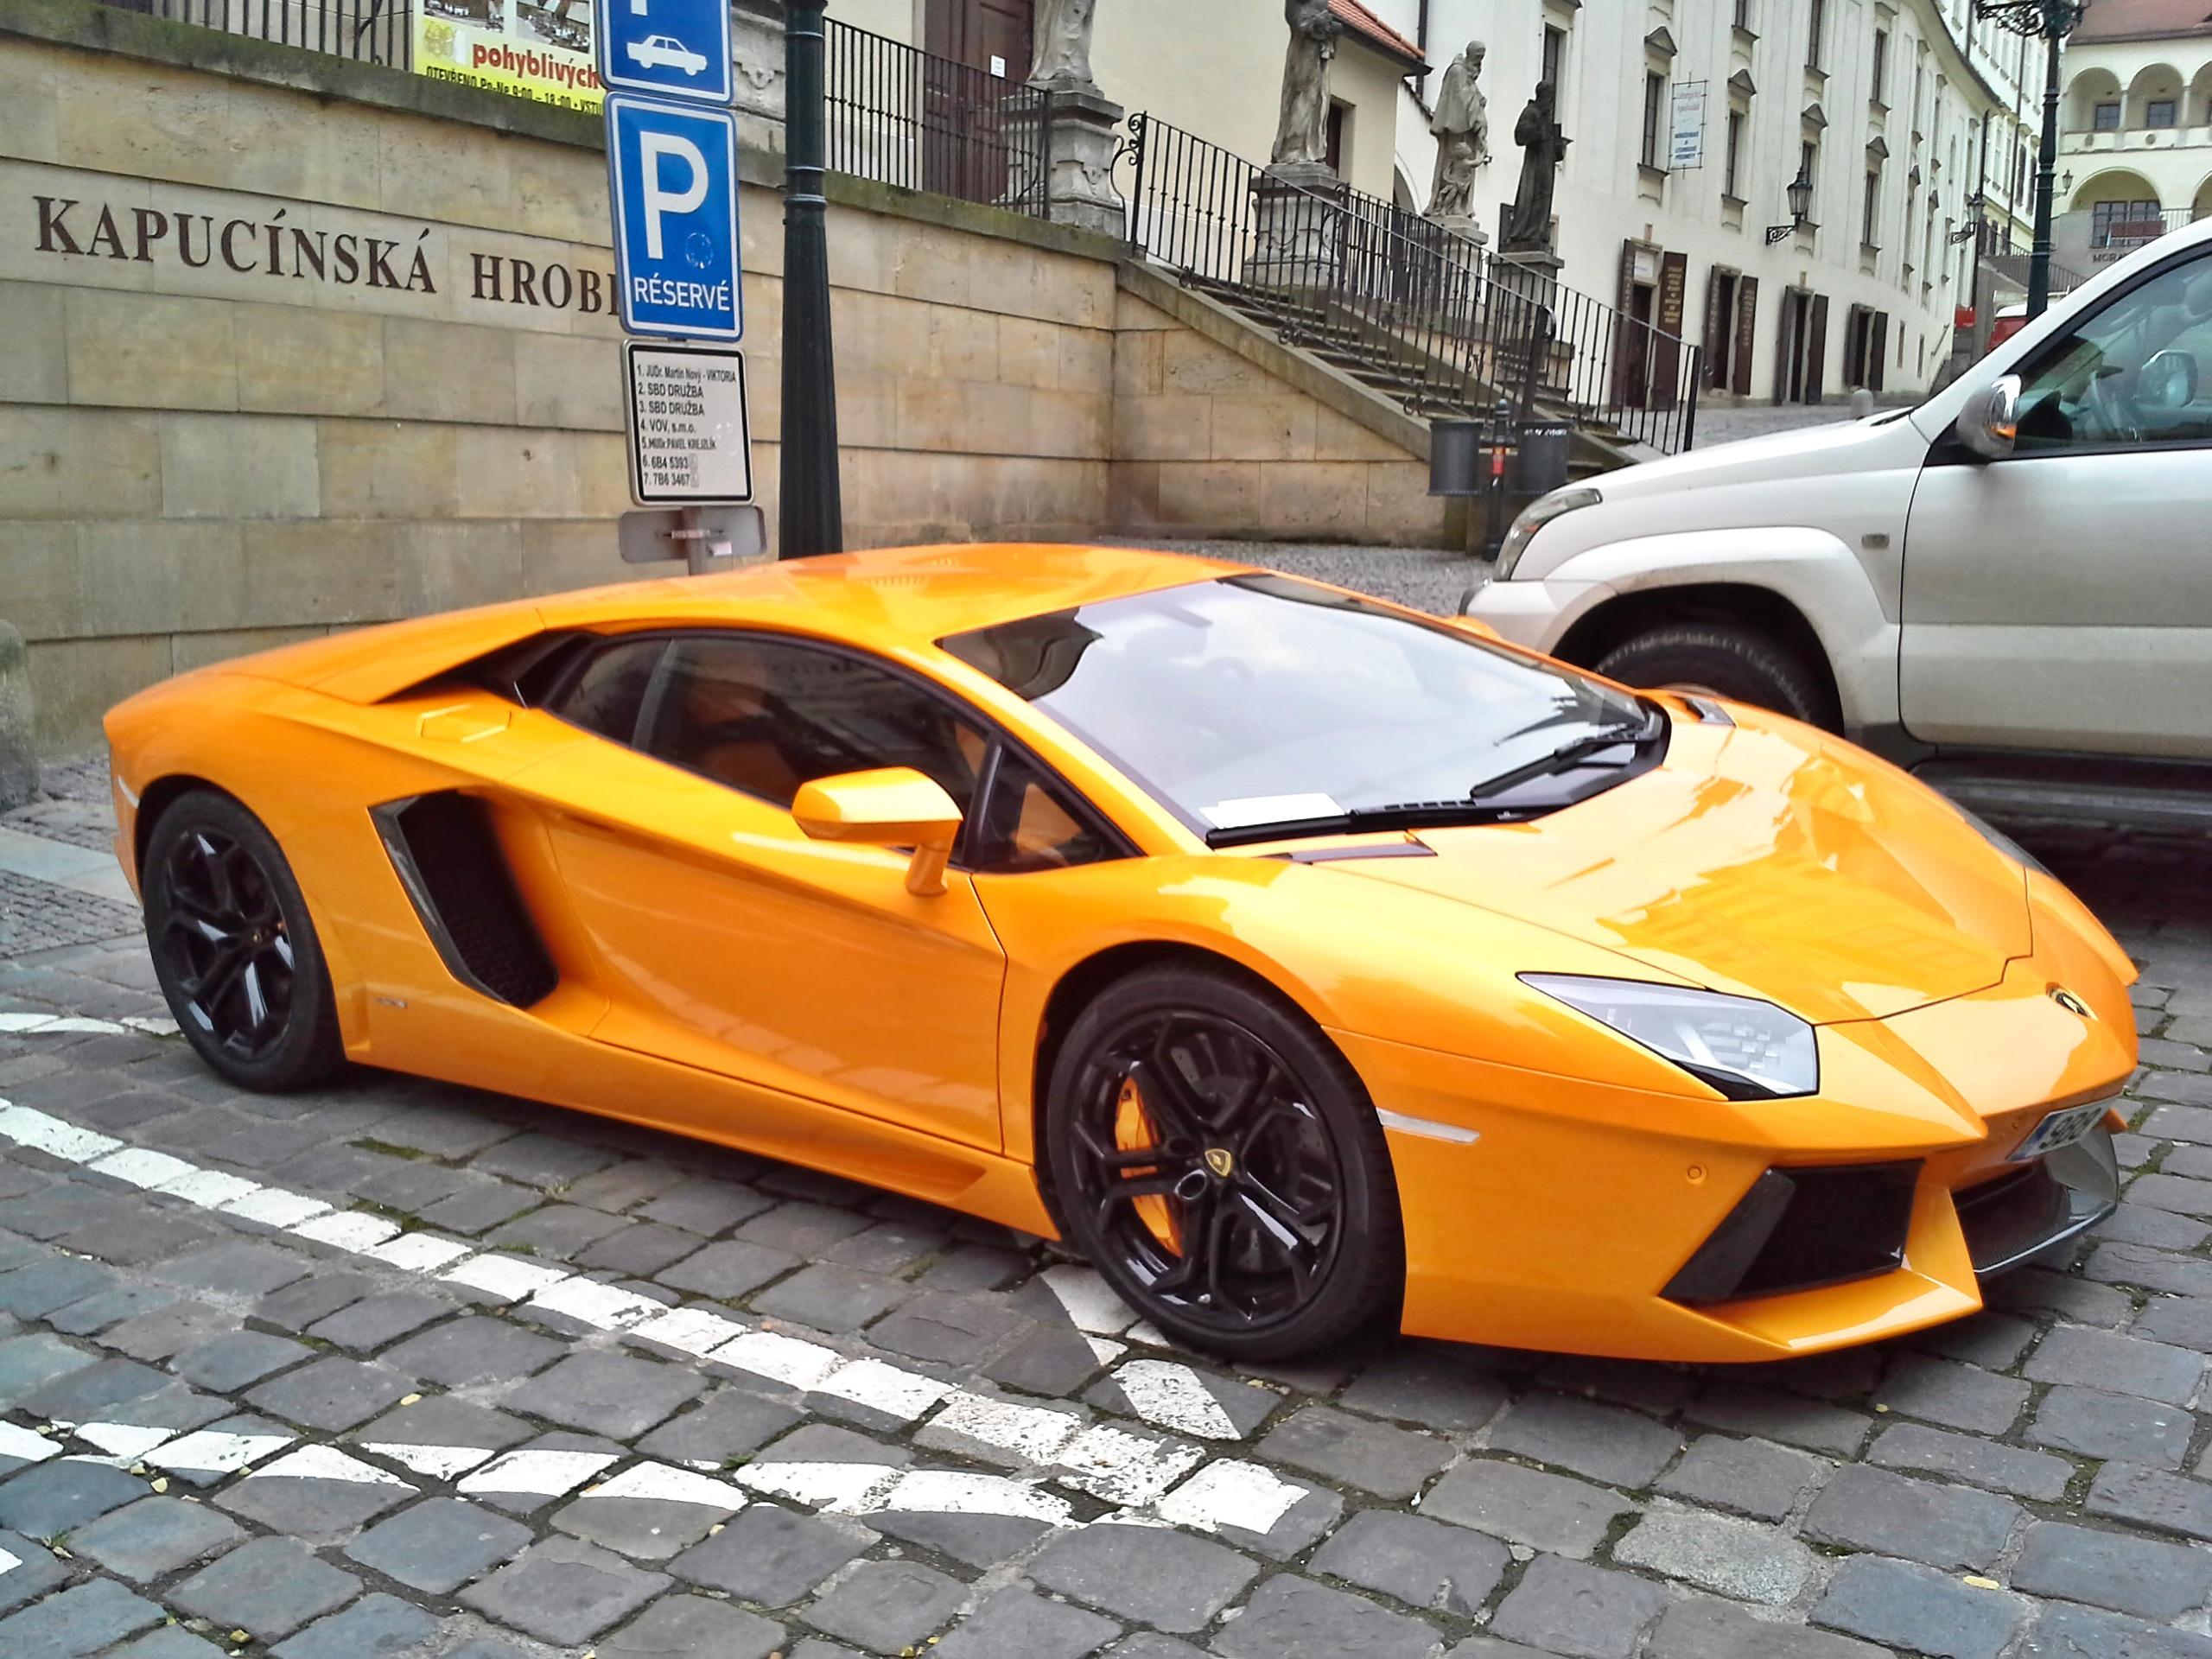 Bildet Hjul Oransje Sportsbil Superbil Makt Biler